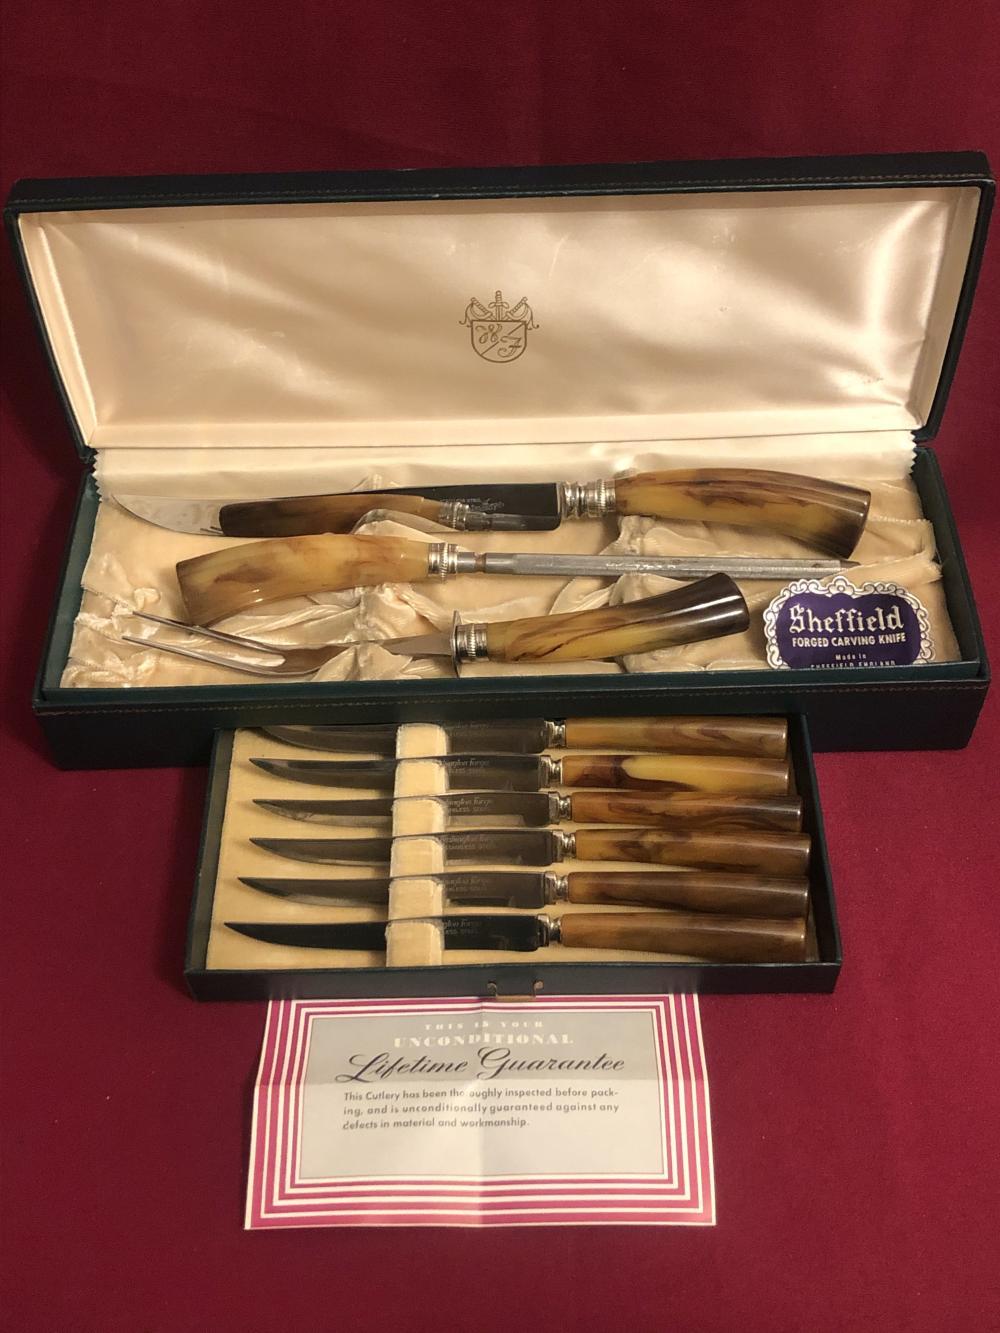 Vintage Washington Forge Sheffield carving & knife set